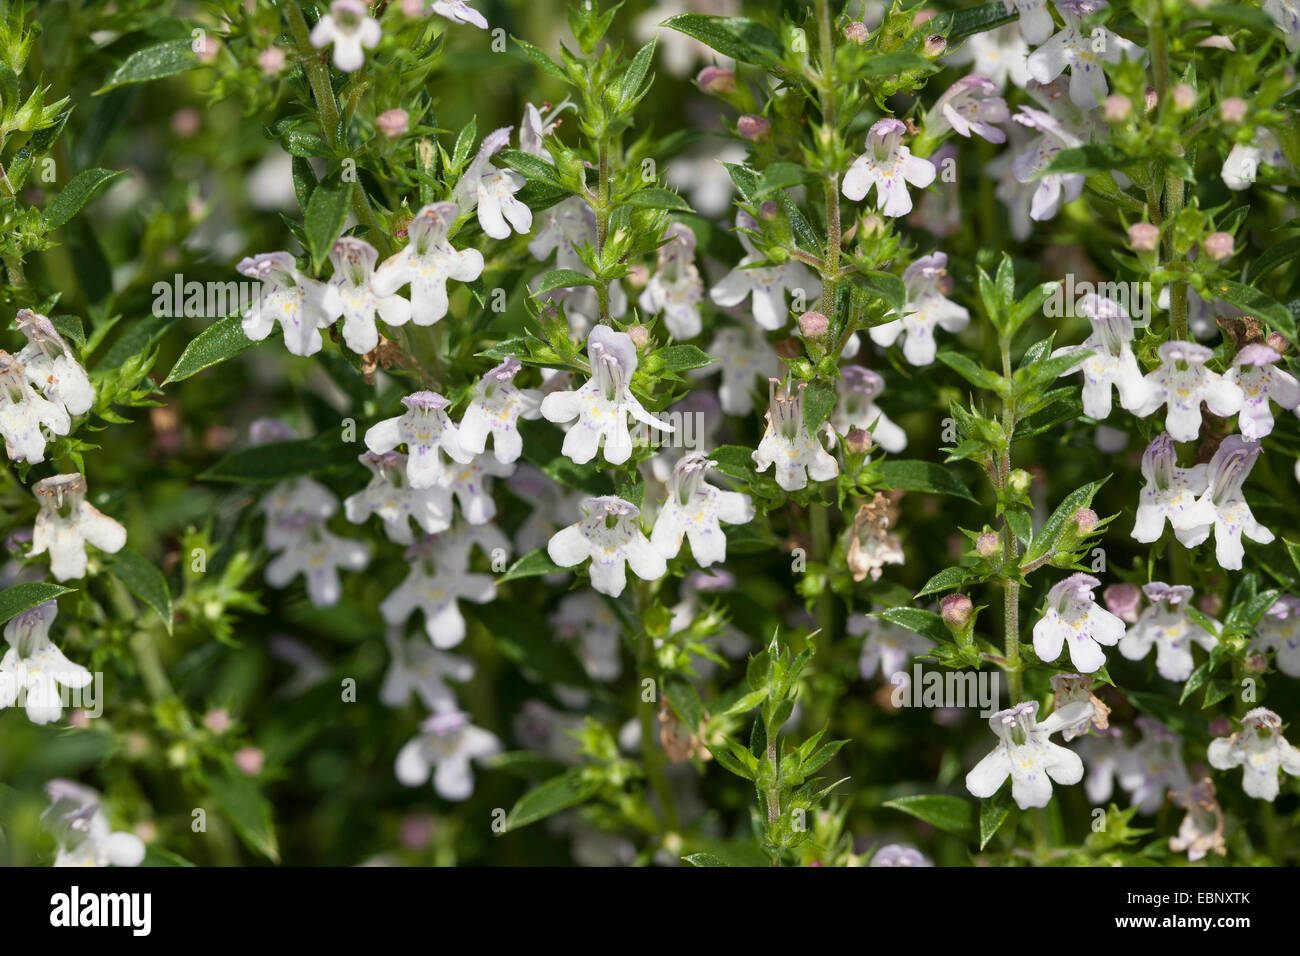 Winter savory (Satureja montana), blooming - Stock Image